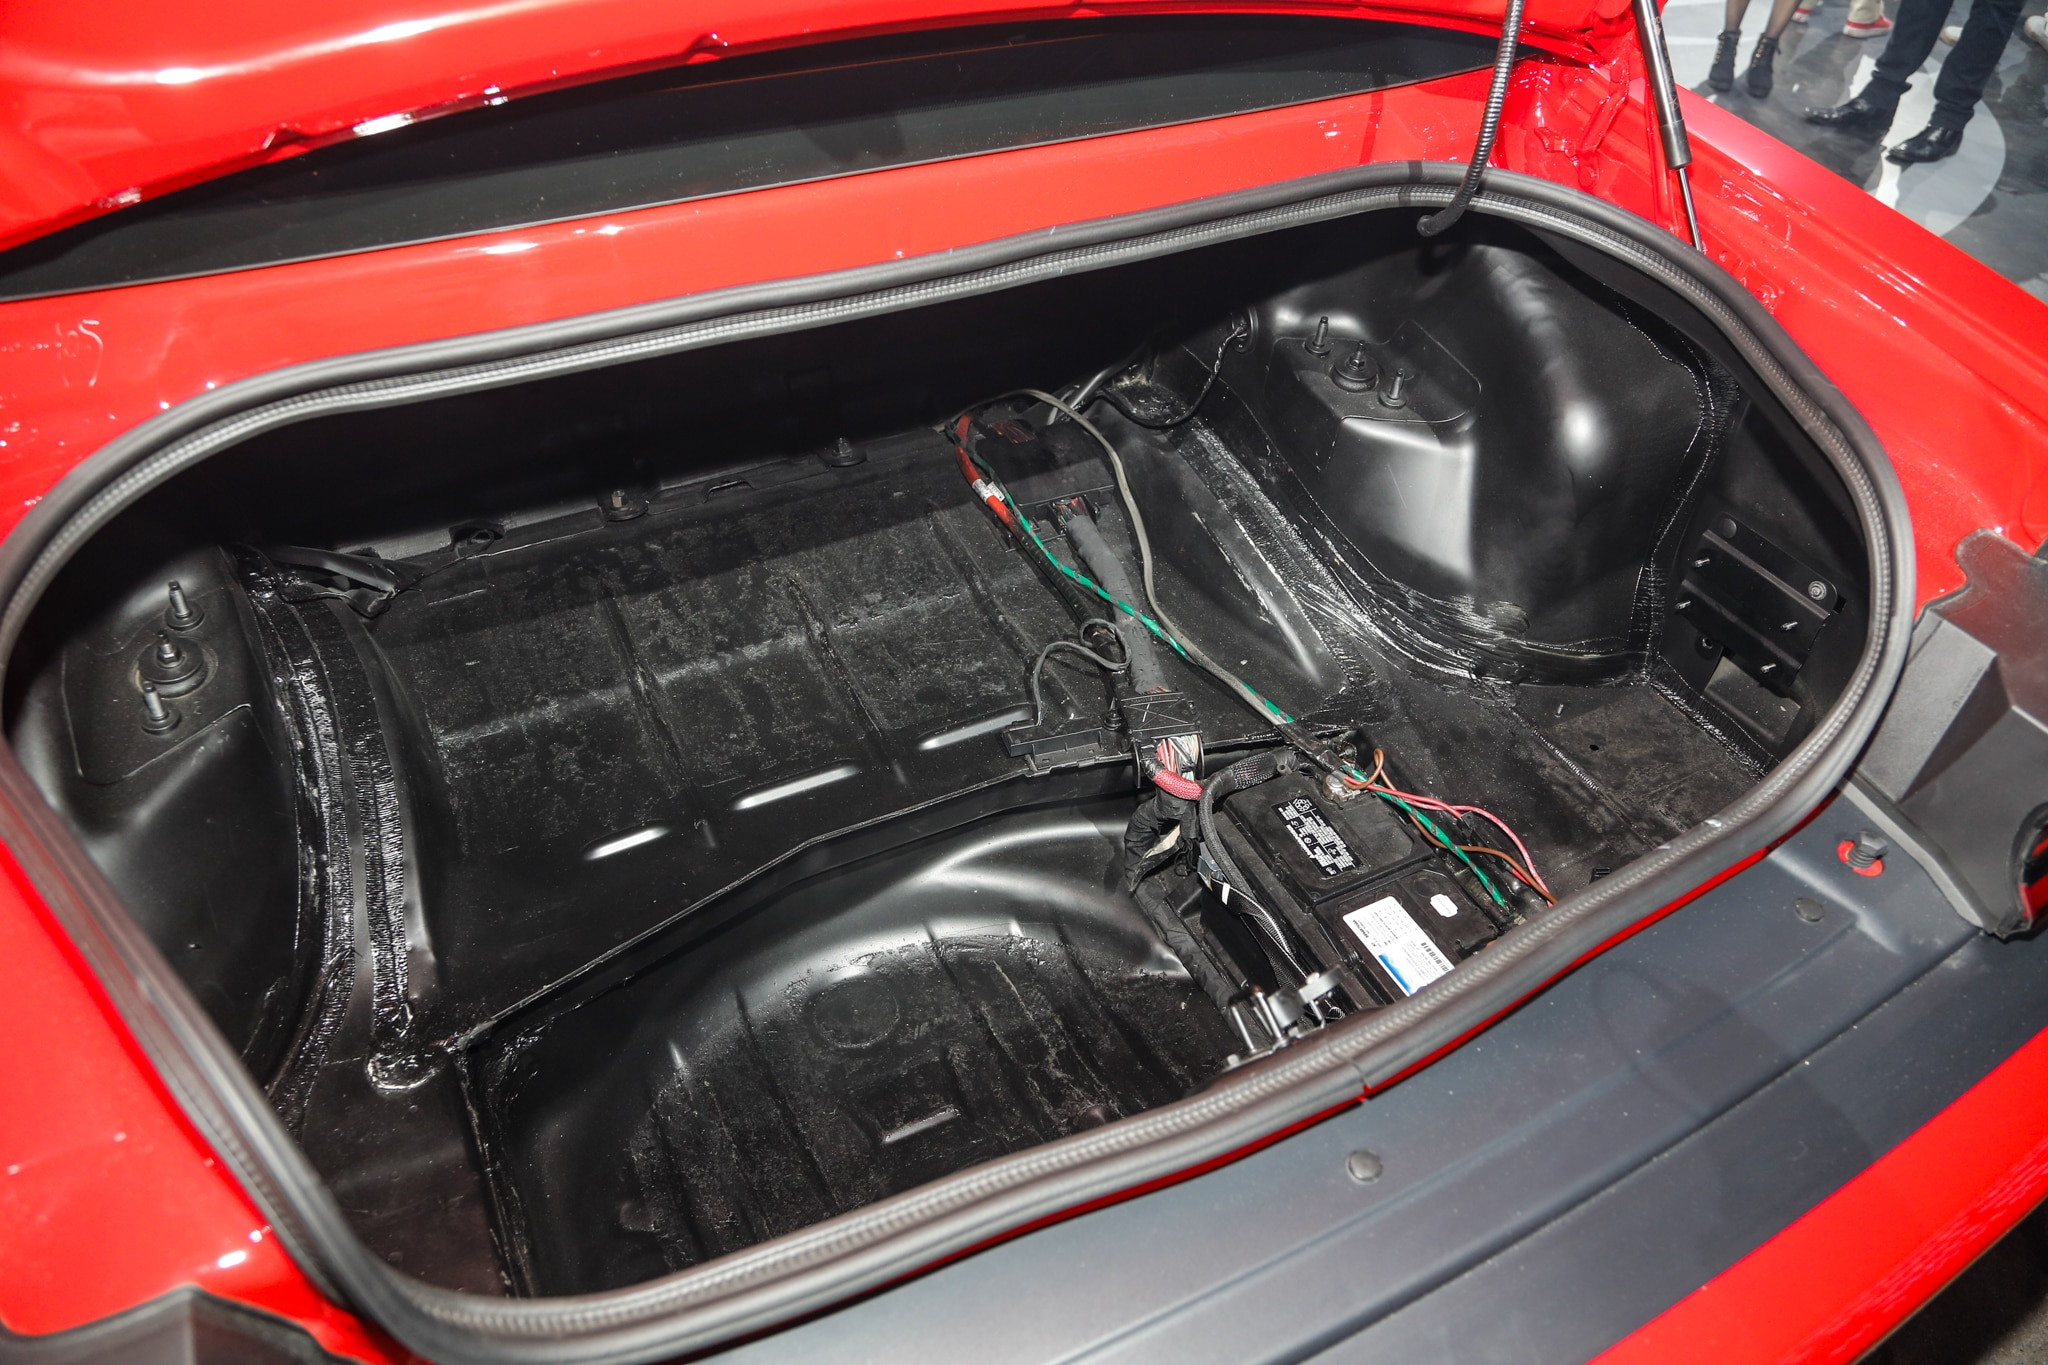 2018 Dodge Challenger Srt Demon Trunk 1 Motor Trend En Espa 241 Ol